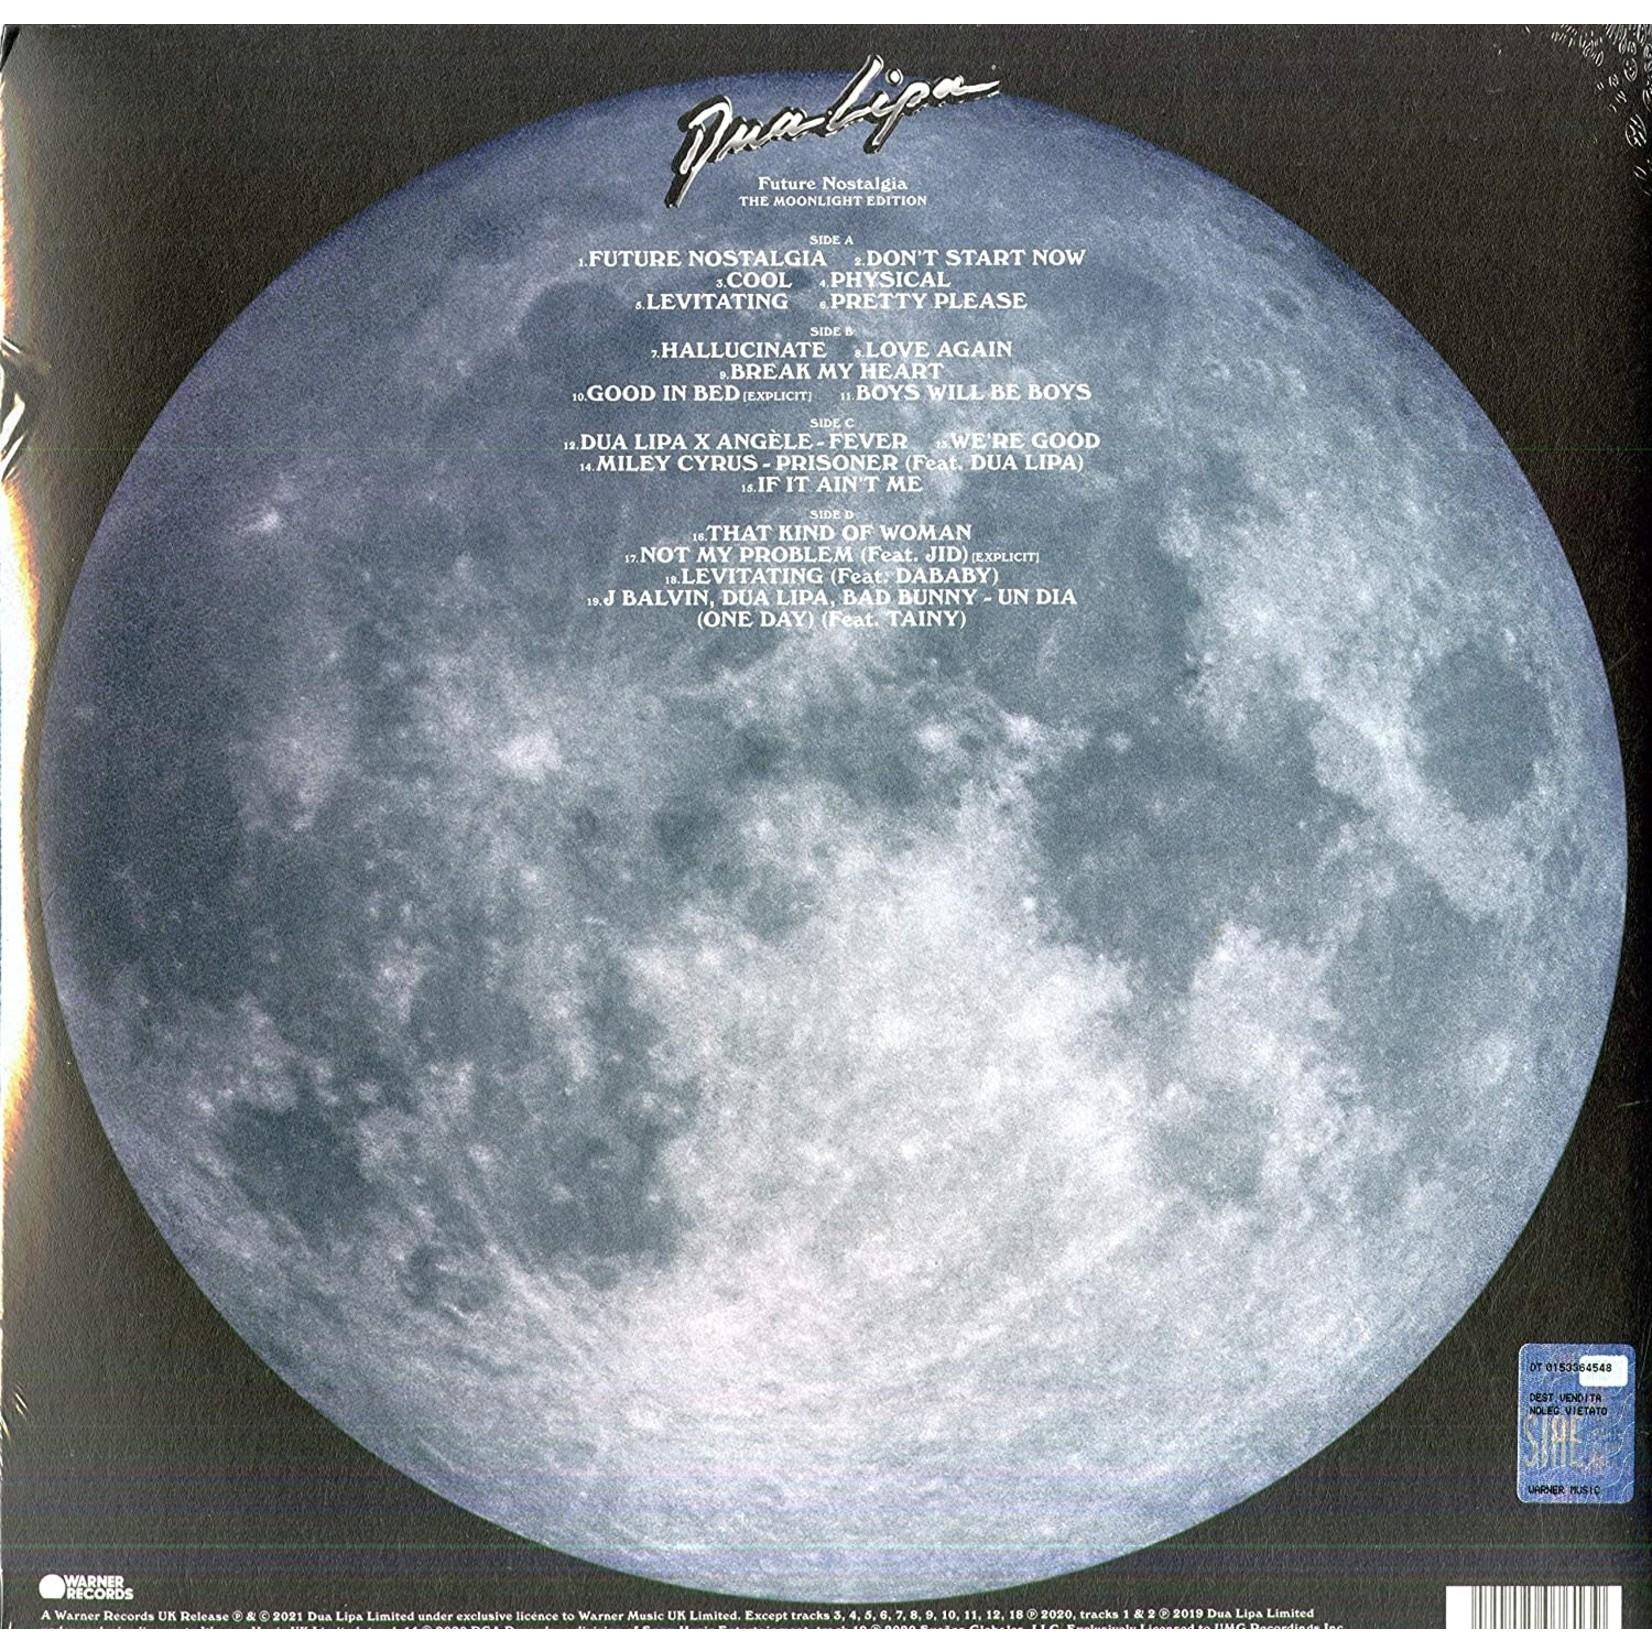 DUA LIPA FUTURE NOSTALGIA (THE MOONLIGHT EDITION) [2 LP]